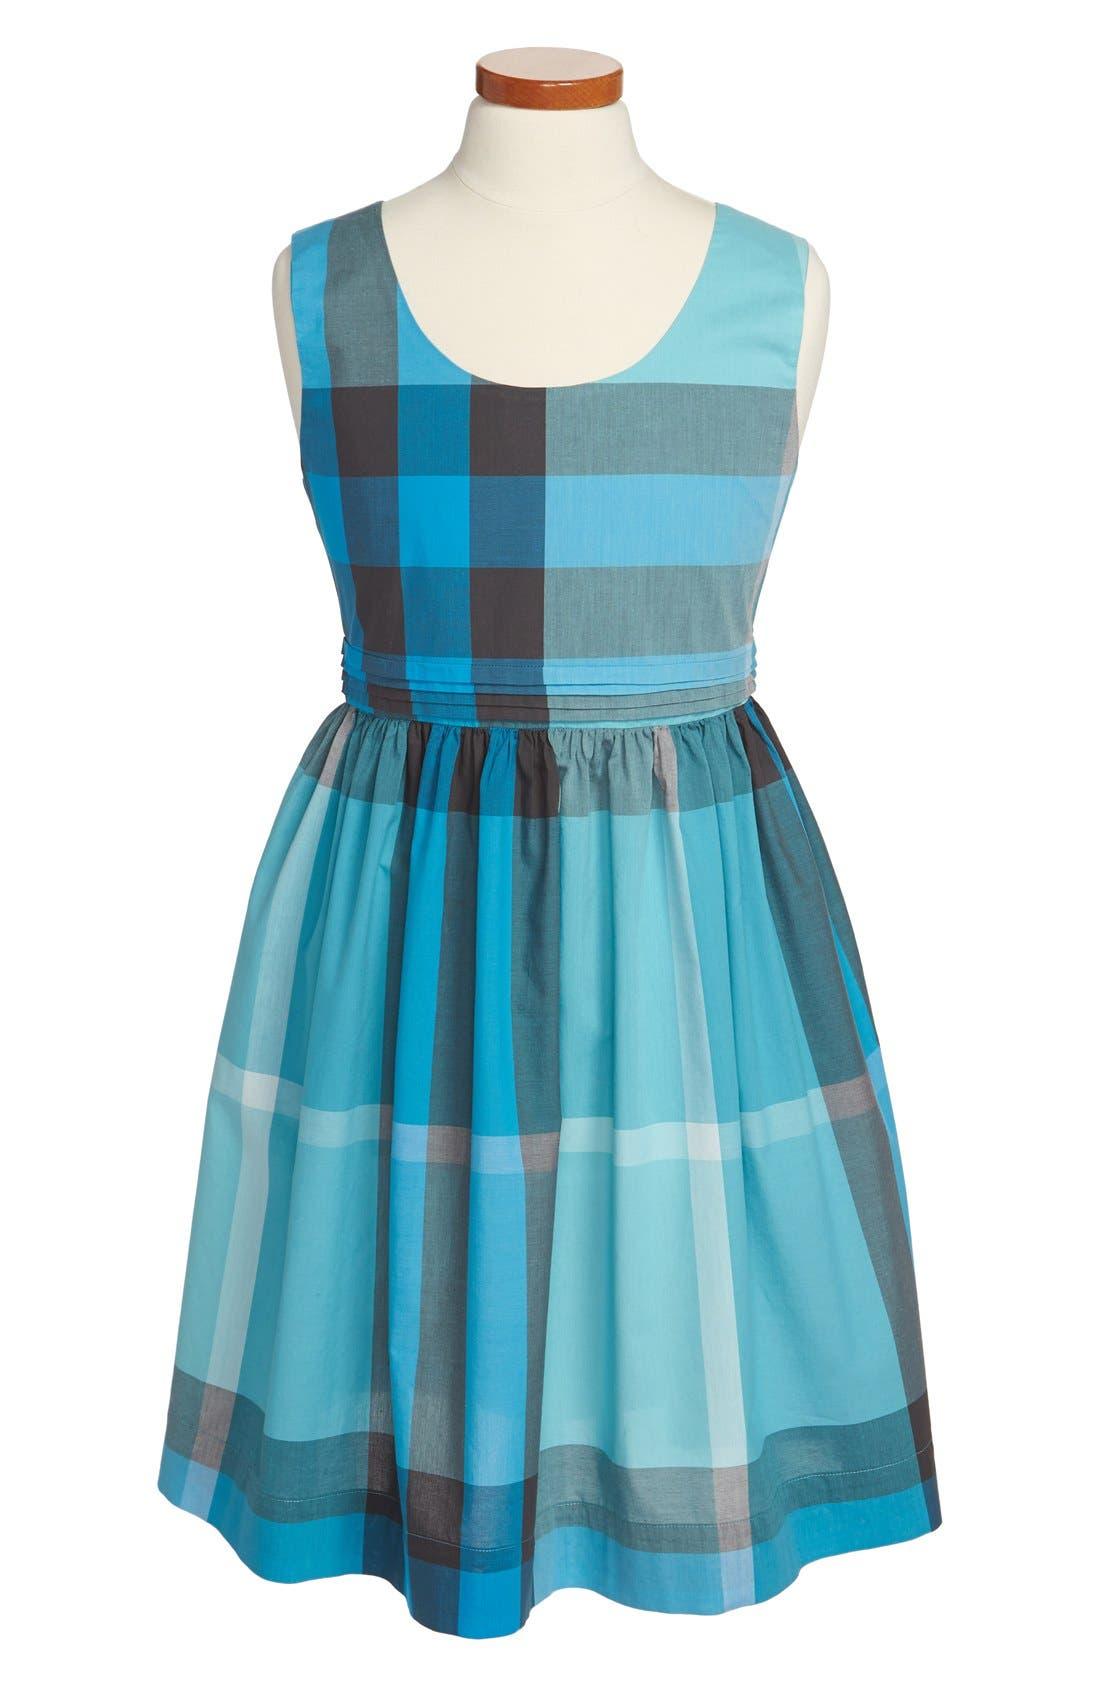 Main Image - Burberry Check Print Cutout Back Cotton Dress (Little Girls & Big Girls)